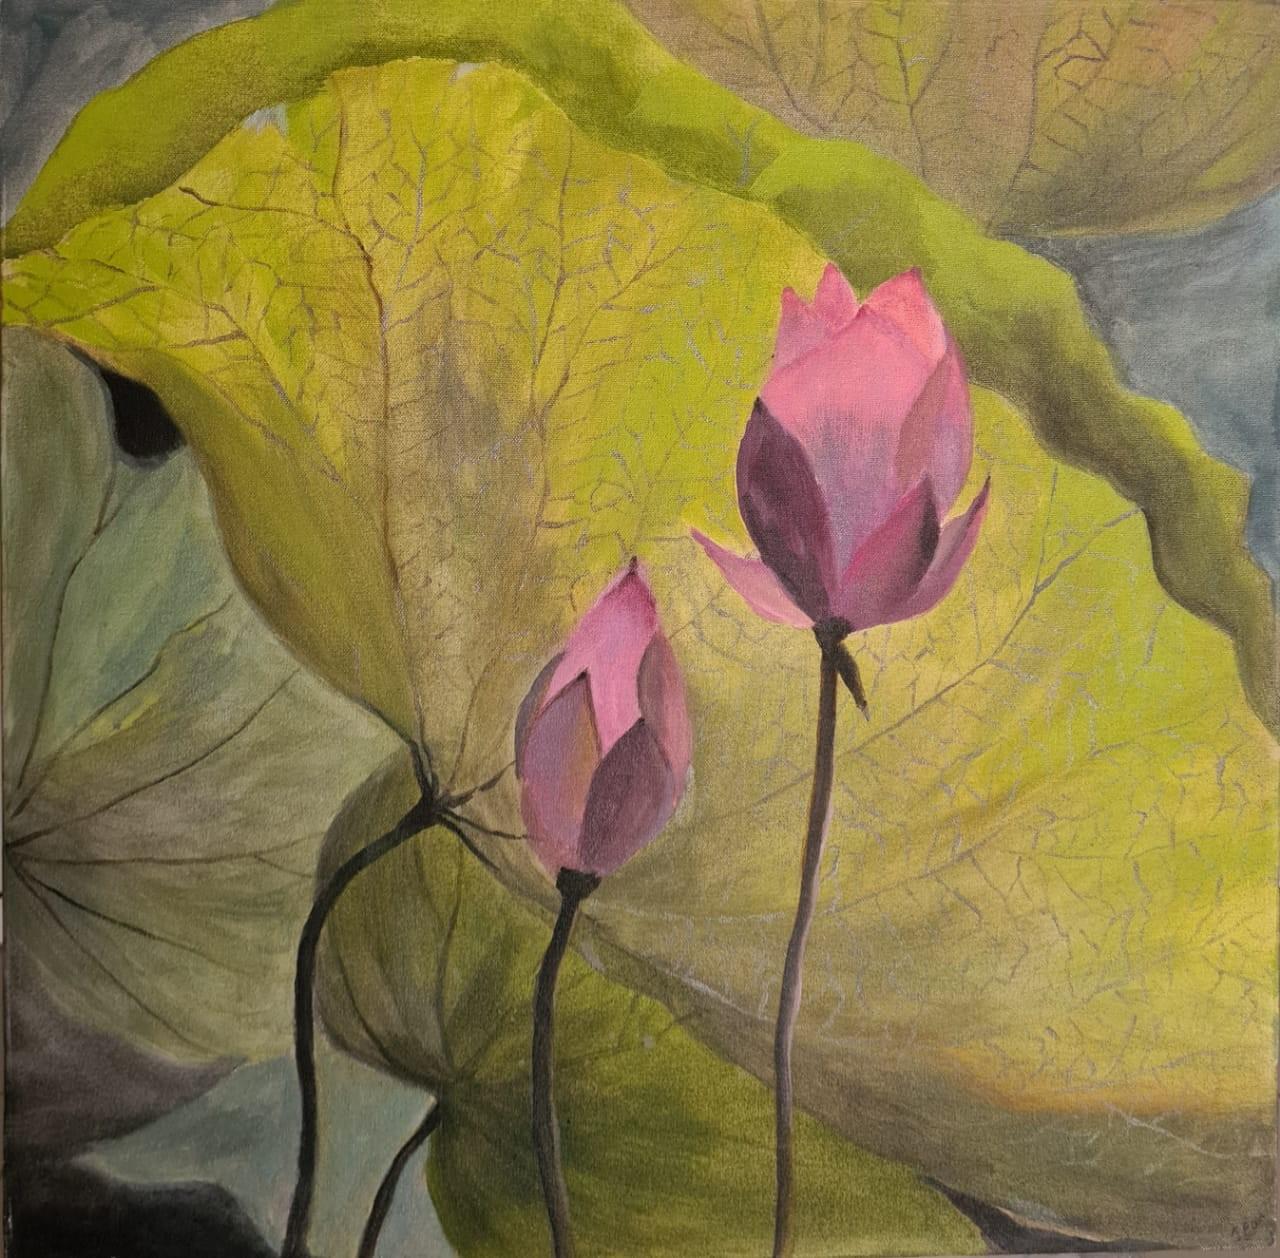 Blooming lotus by Jean wijesekera